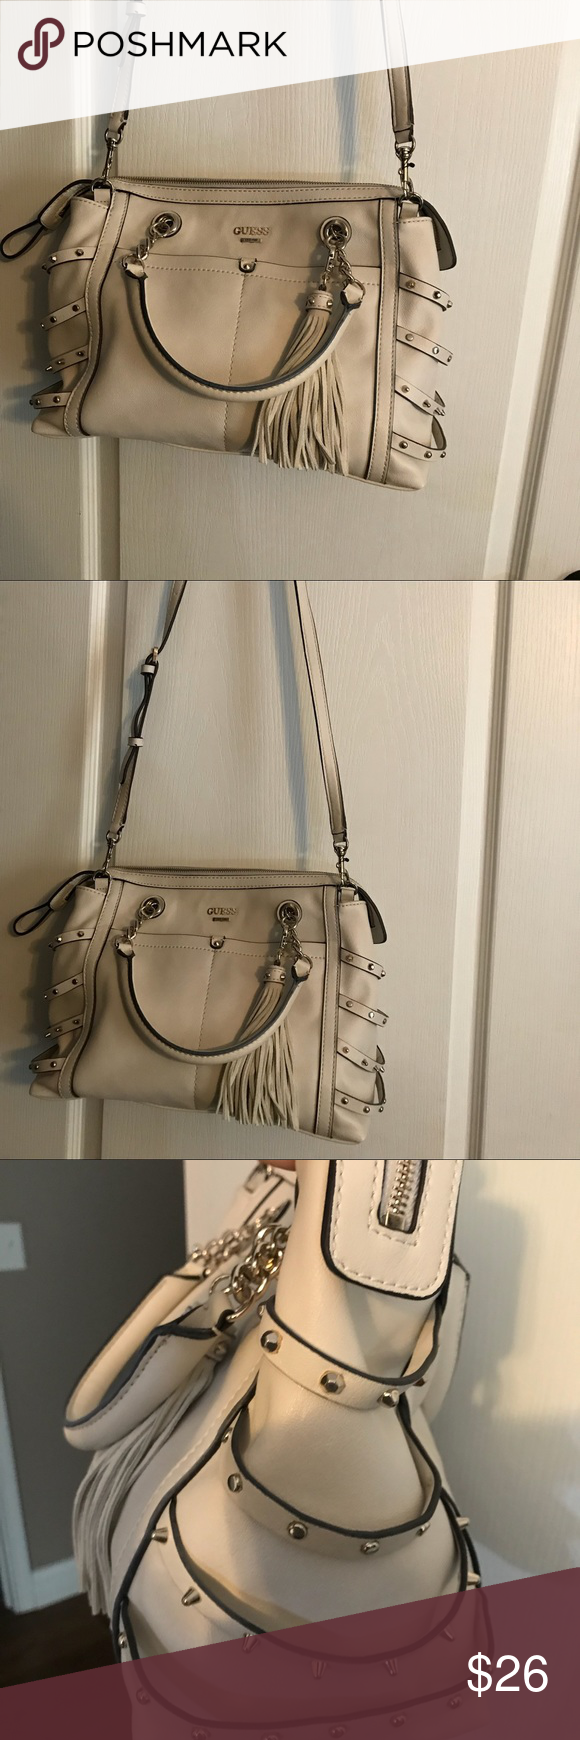 "aac50be1e701 New Guess Cream Leather Handbag. New Guess Cream Leather Handbag 14""Wide 10  1 2"" Deep 5 1 4"" Bottom Has Crossbody Strap. Smoke free home."